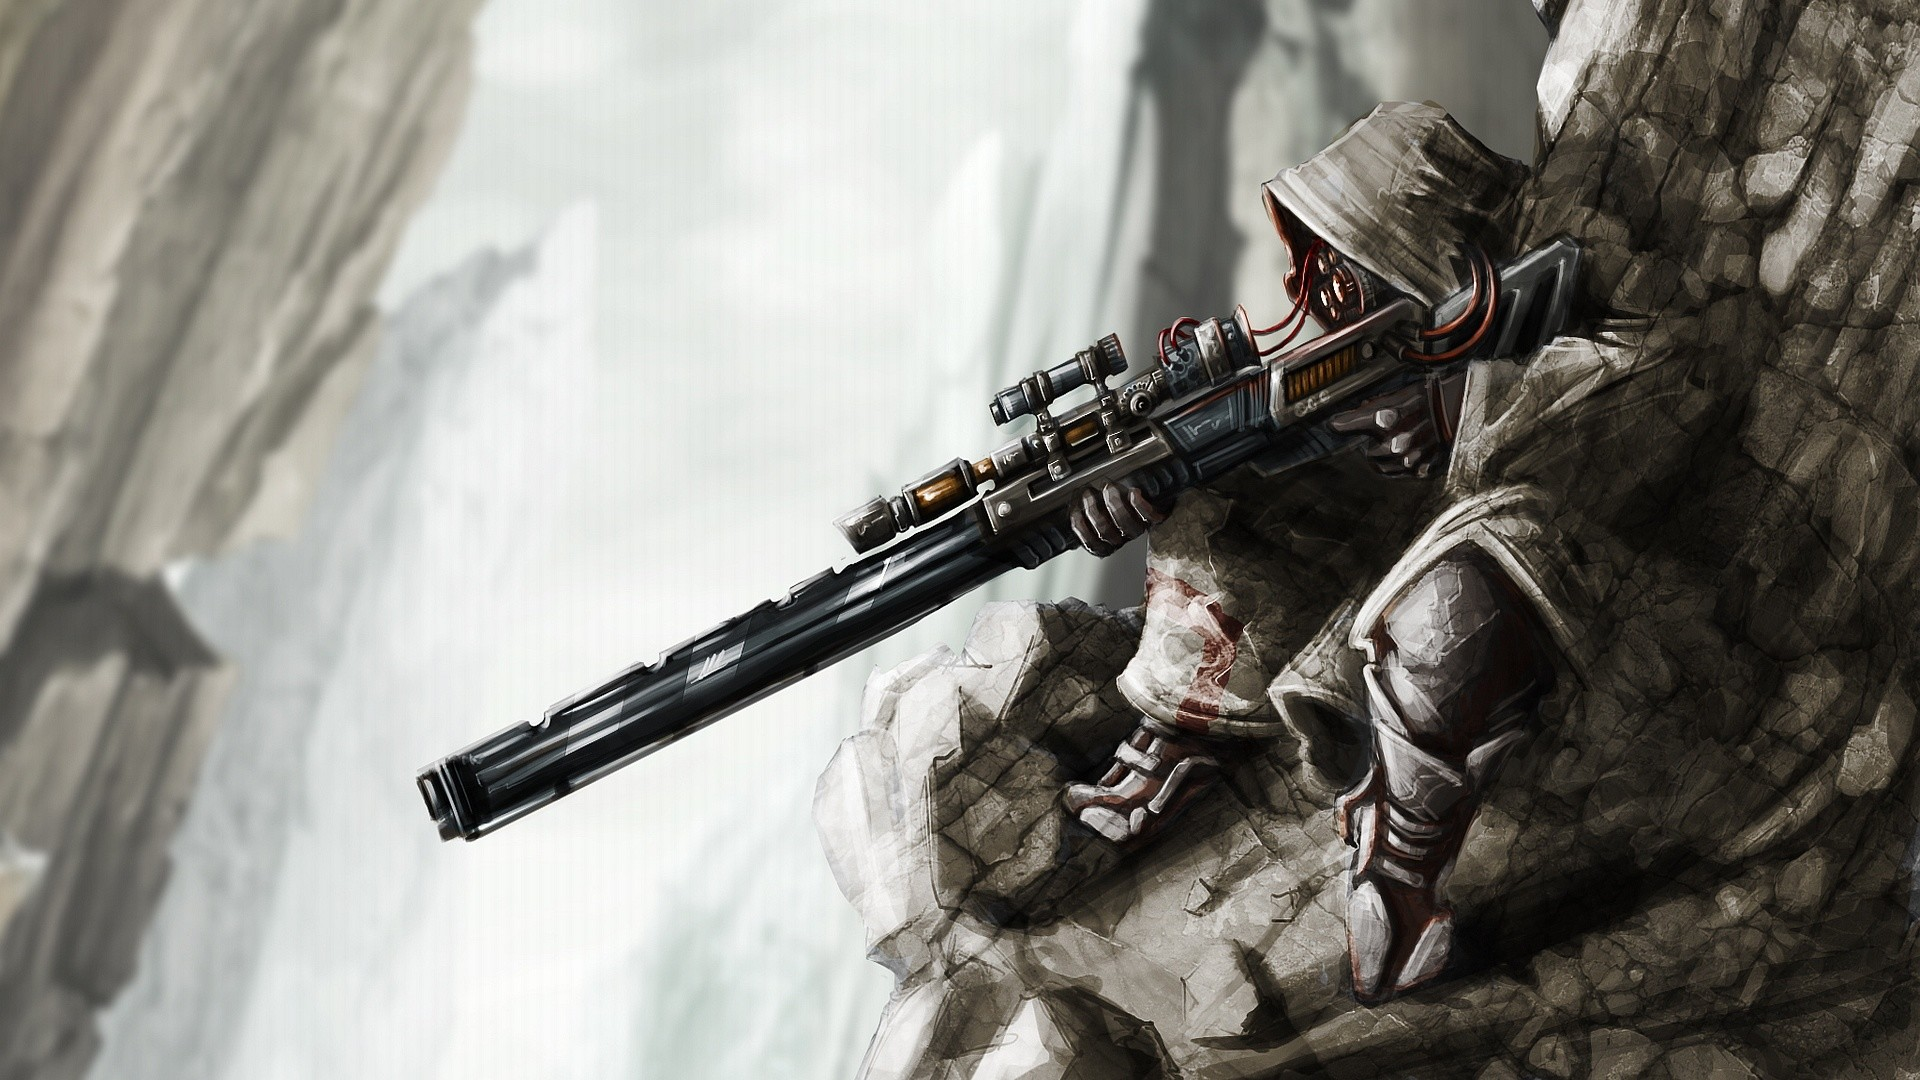 Download Wallpaper Sniper ghost warrior 3, Sniper .